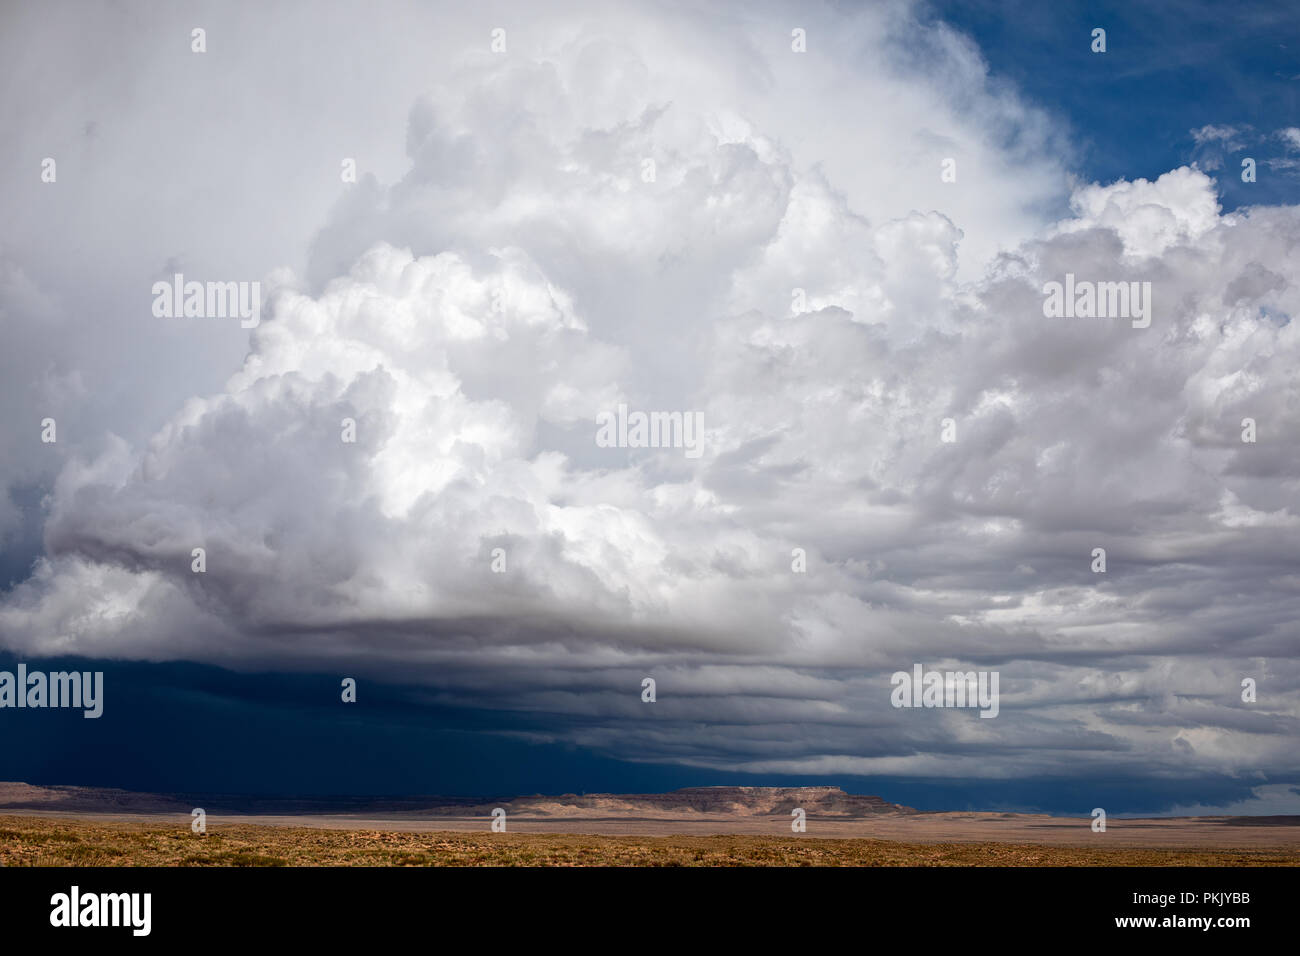 Cumulonimbus clouds with a blue sky background - Stock Image